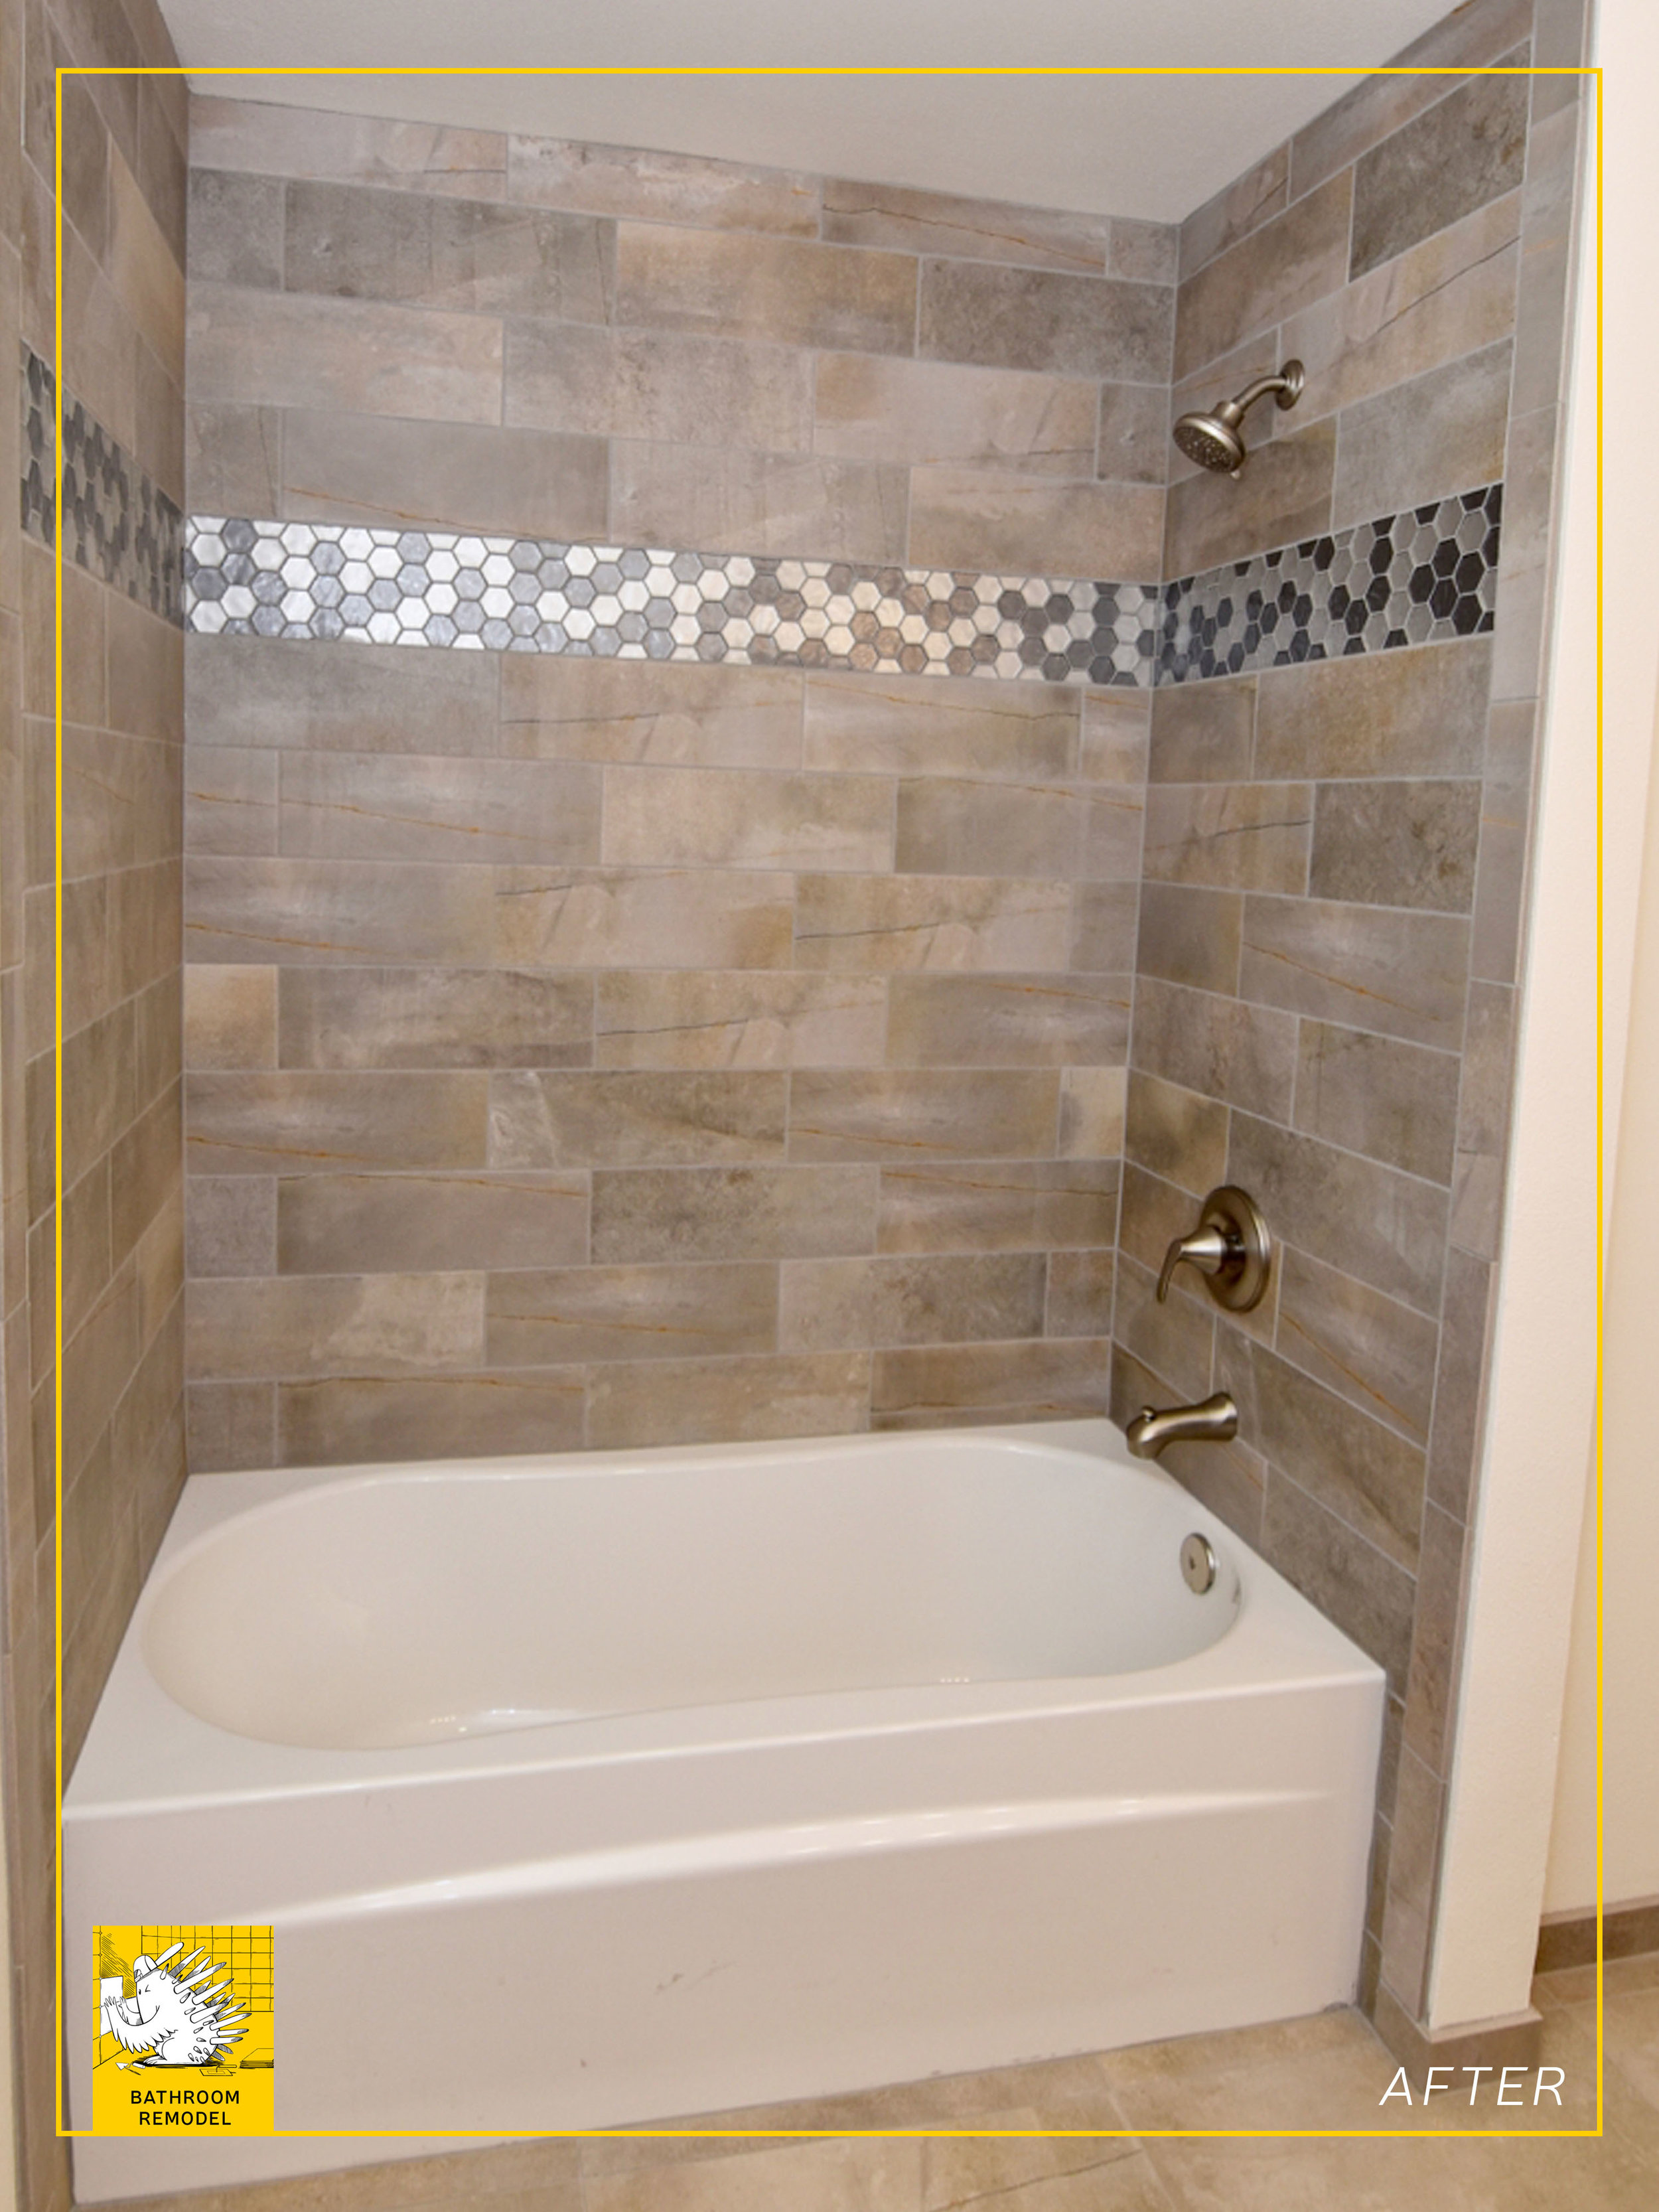 MT bathroom 1 after 2.jpg